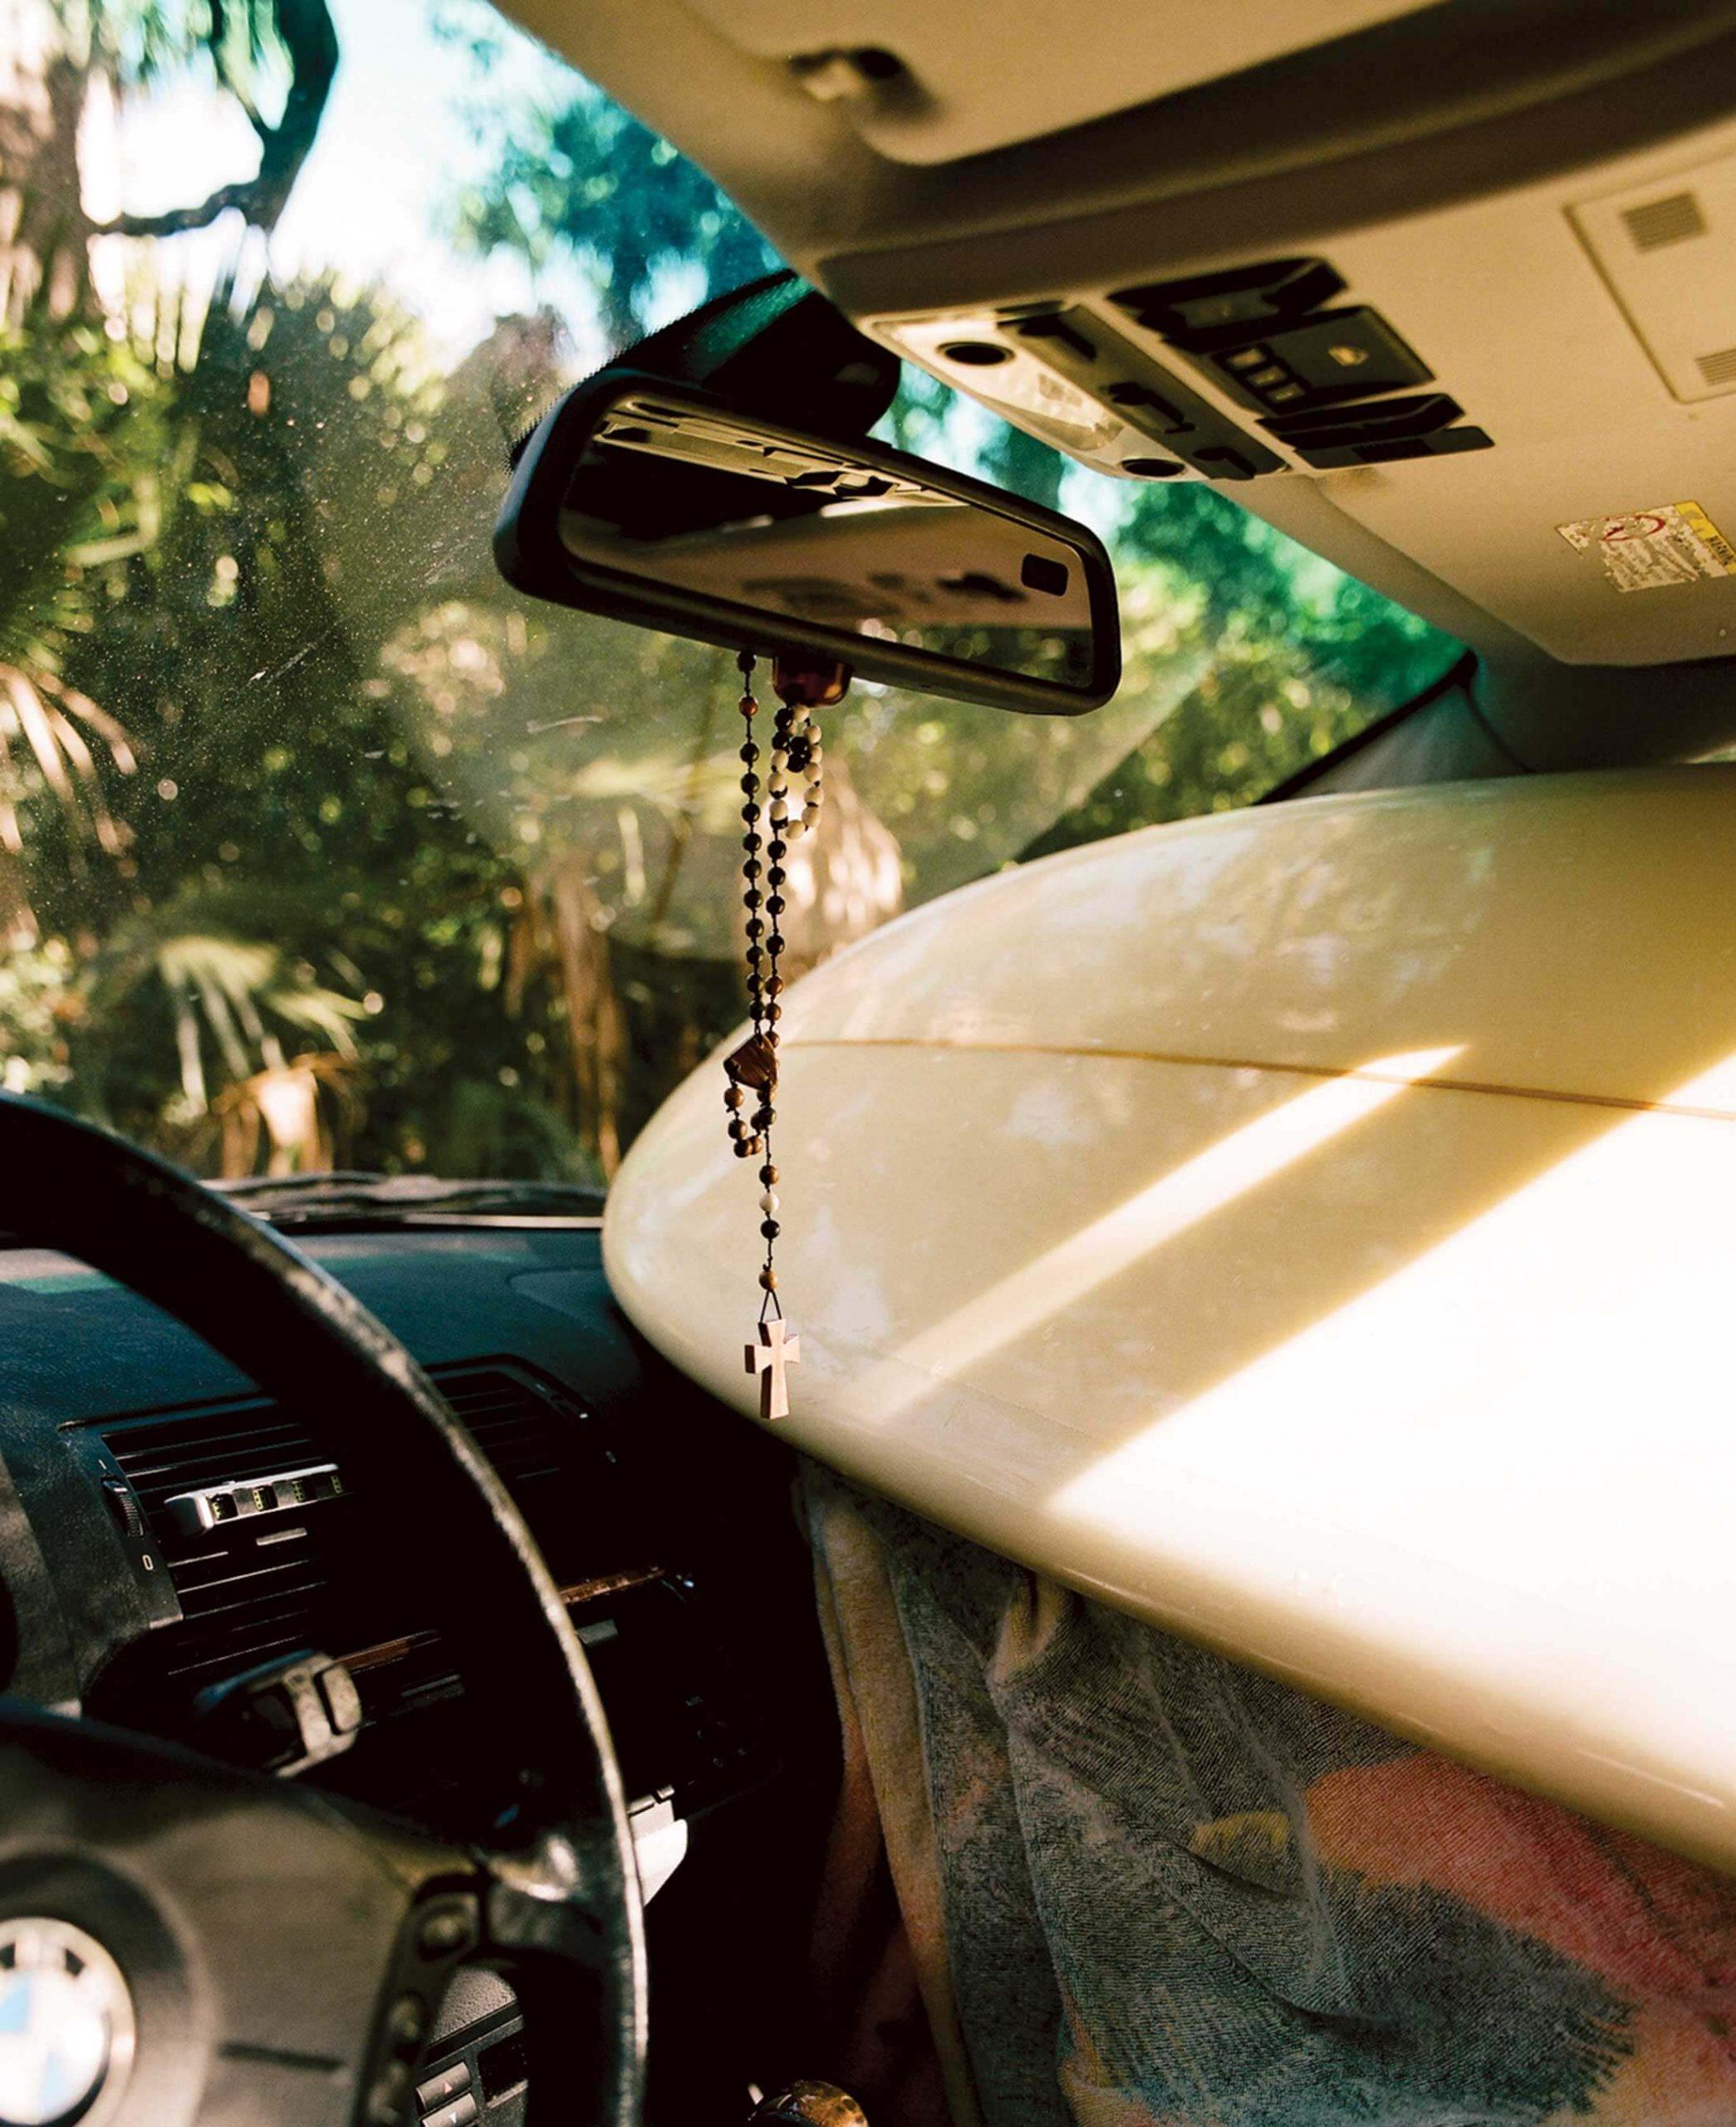 Lucas's car after the surf.